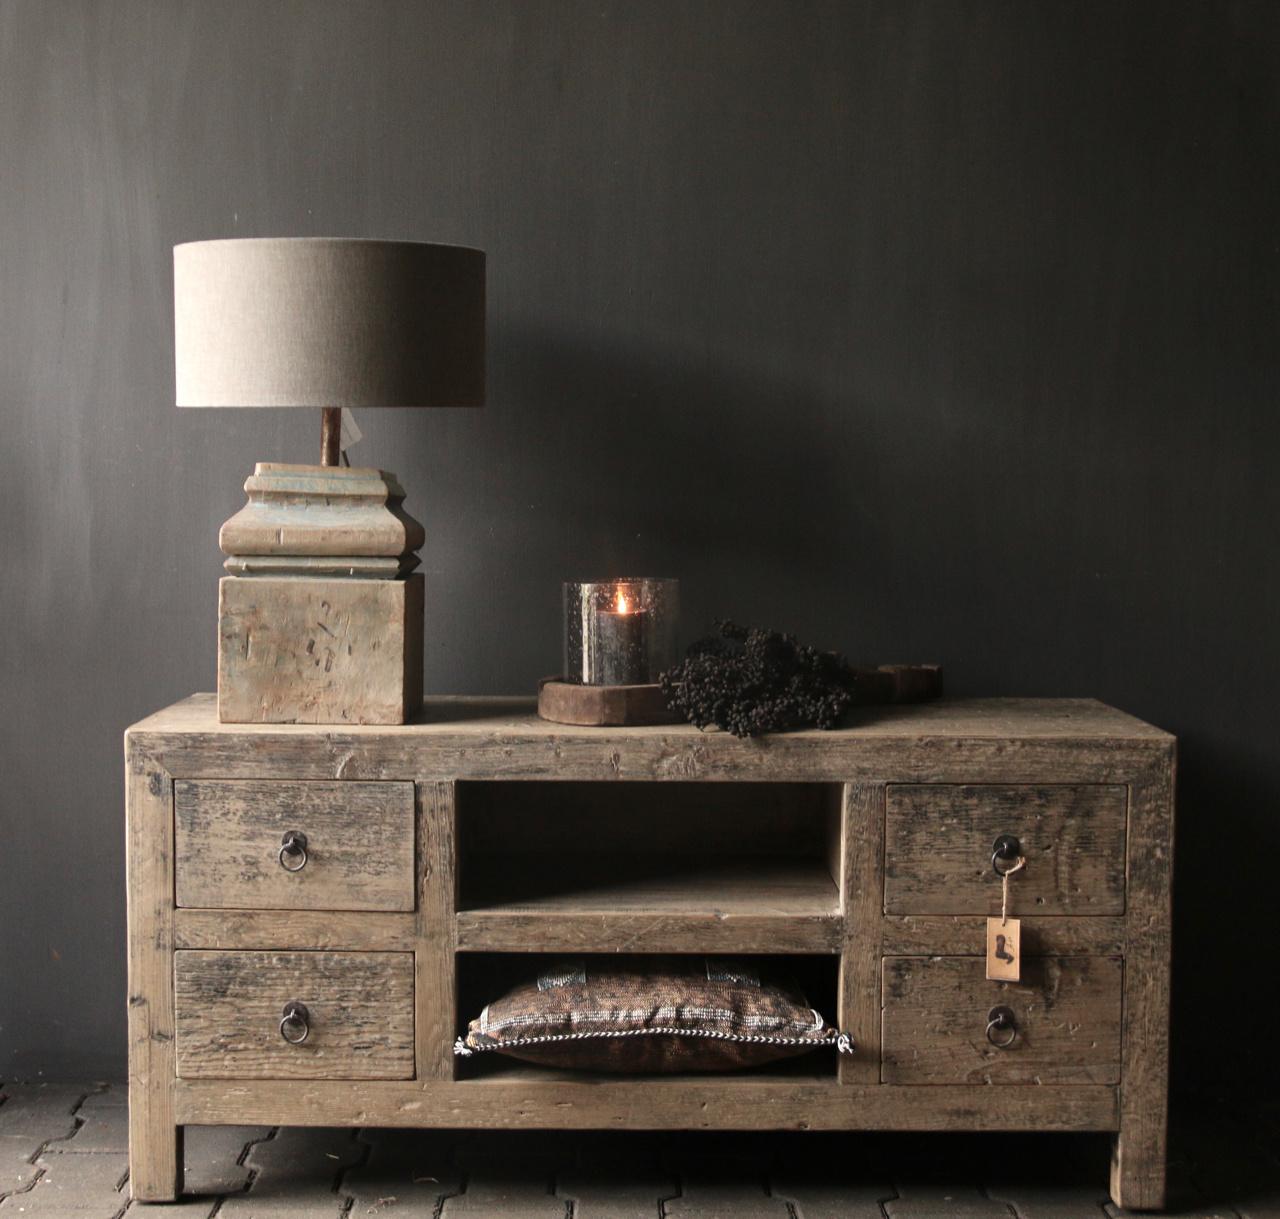 Tv Furniture / sideboard from old Elmwood-2